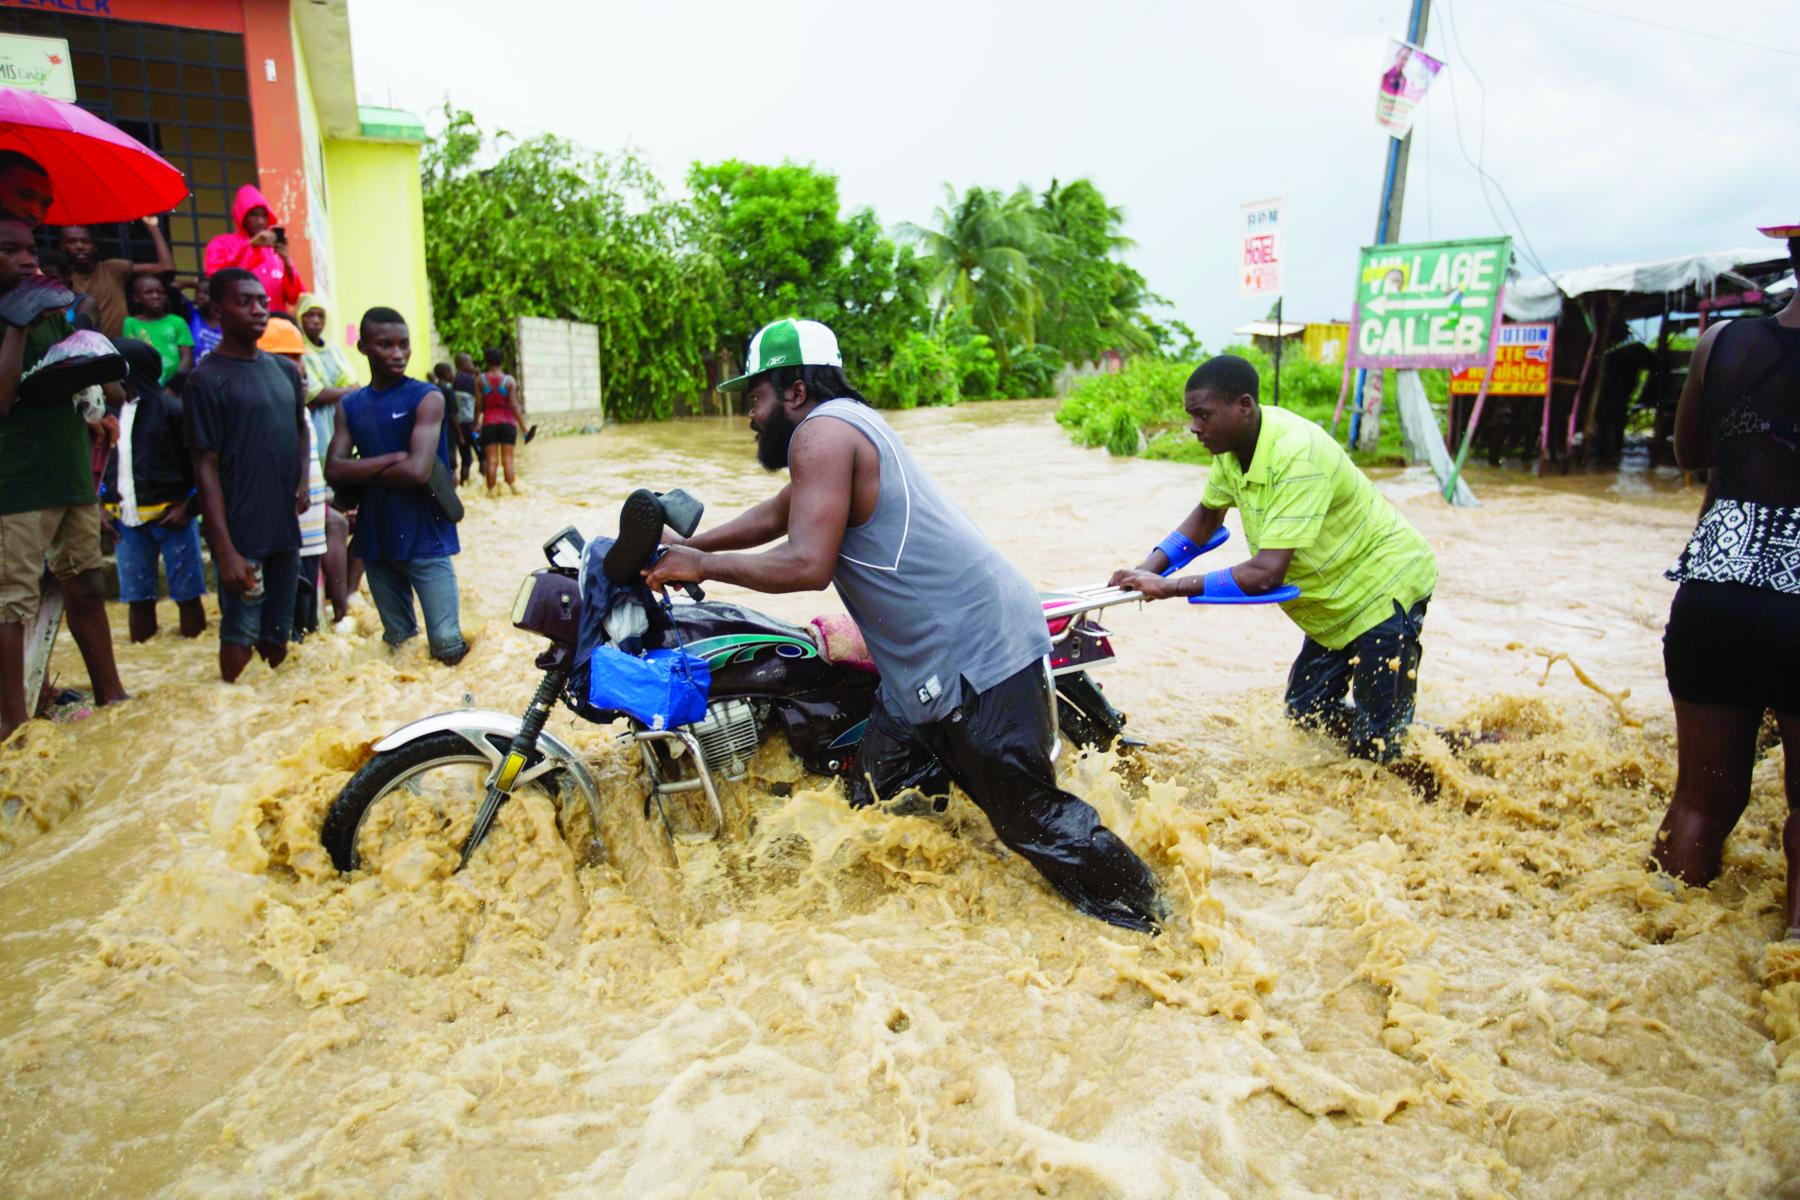 Haití: Se eleva a 264 el número de muertos por huracán Matthew